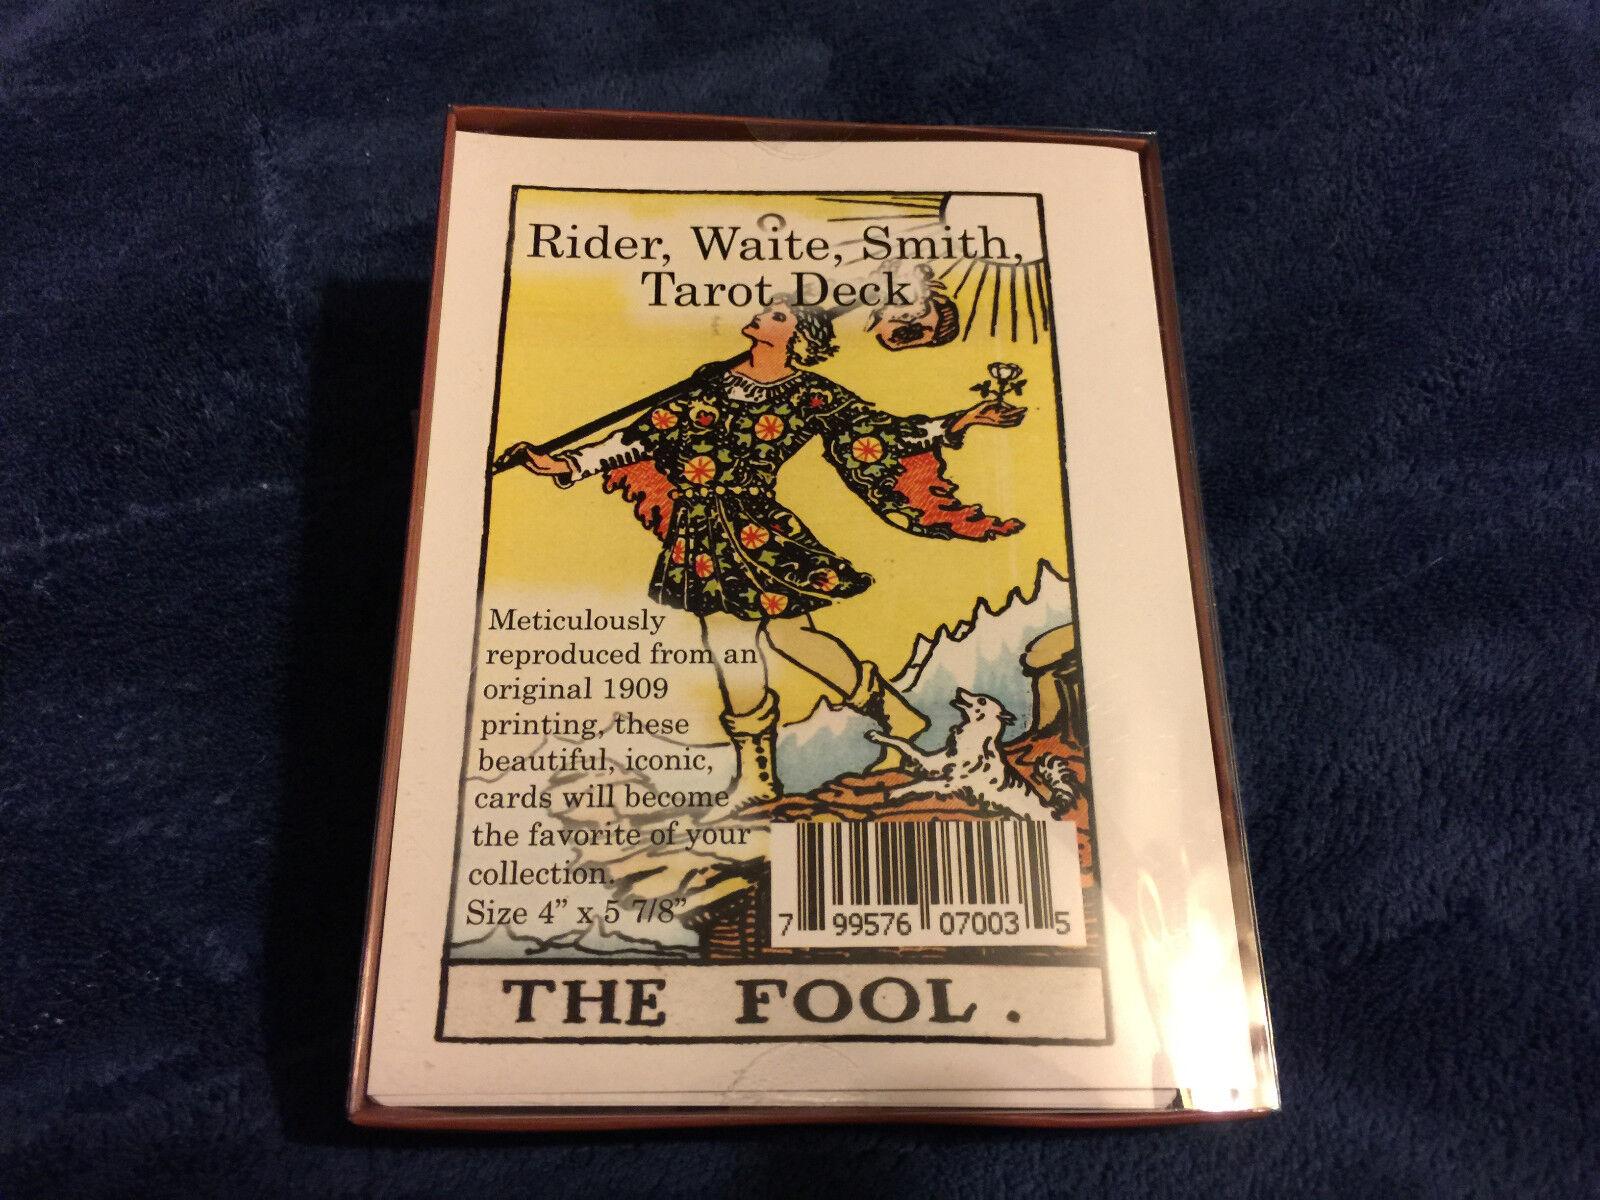 "Rider Waite Smith Tarot Cards Deck 78 Cards GIANT size deck 4"" x 5 3/4"""